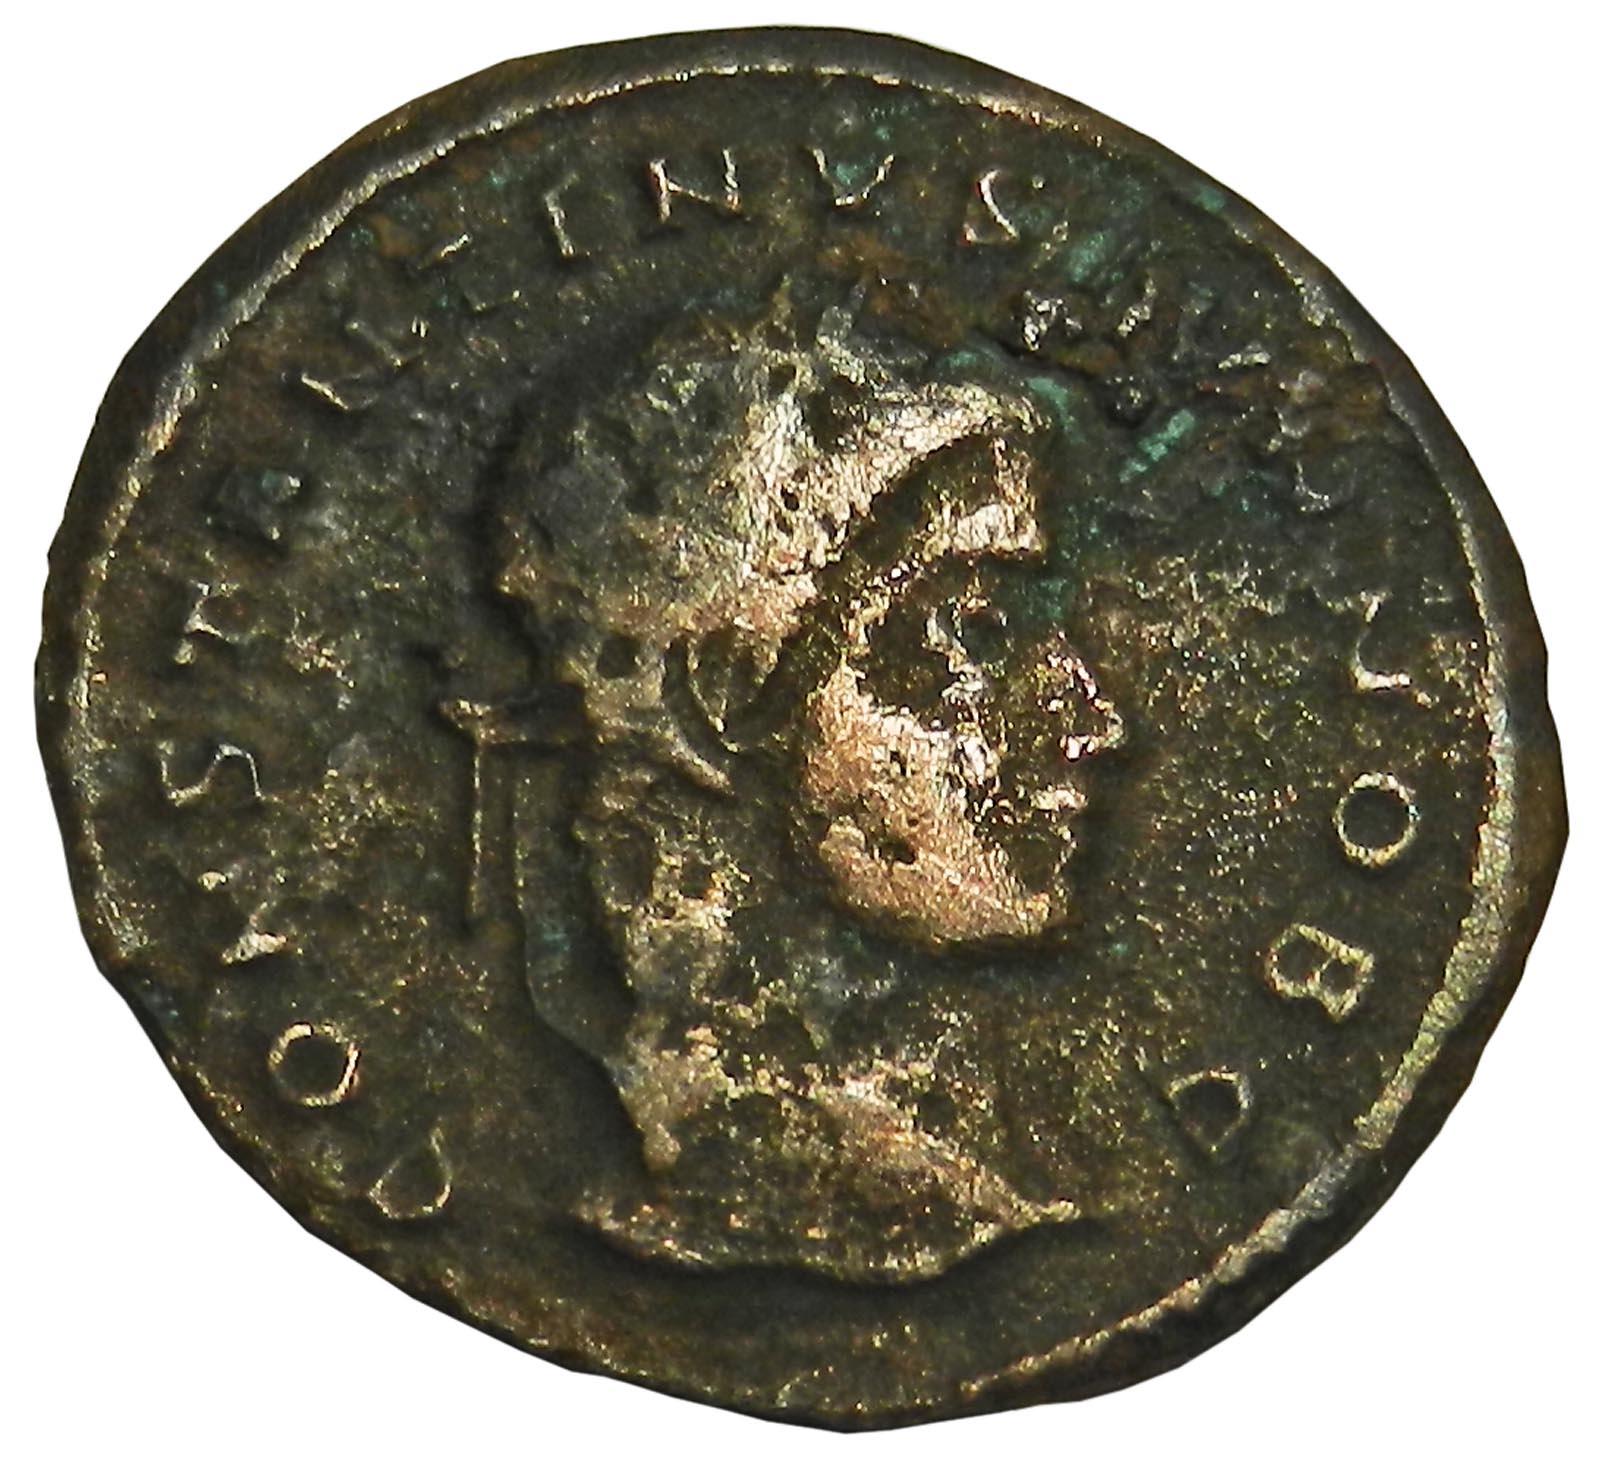 Монета фоллис. Константин II. Бронза. Древний Рим, 321-324 гг (Венок)